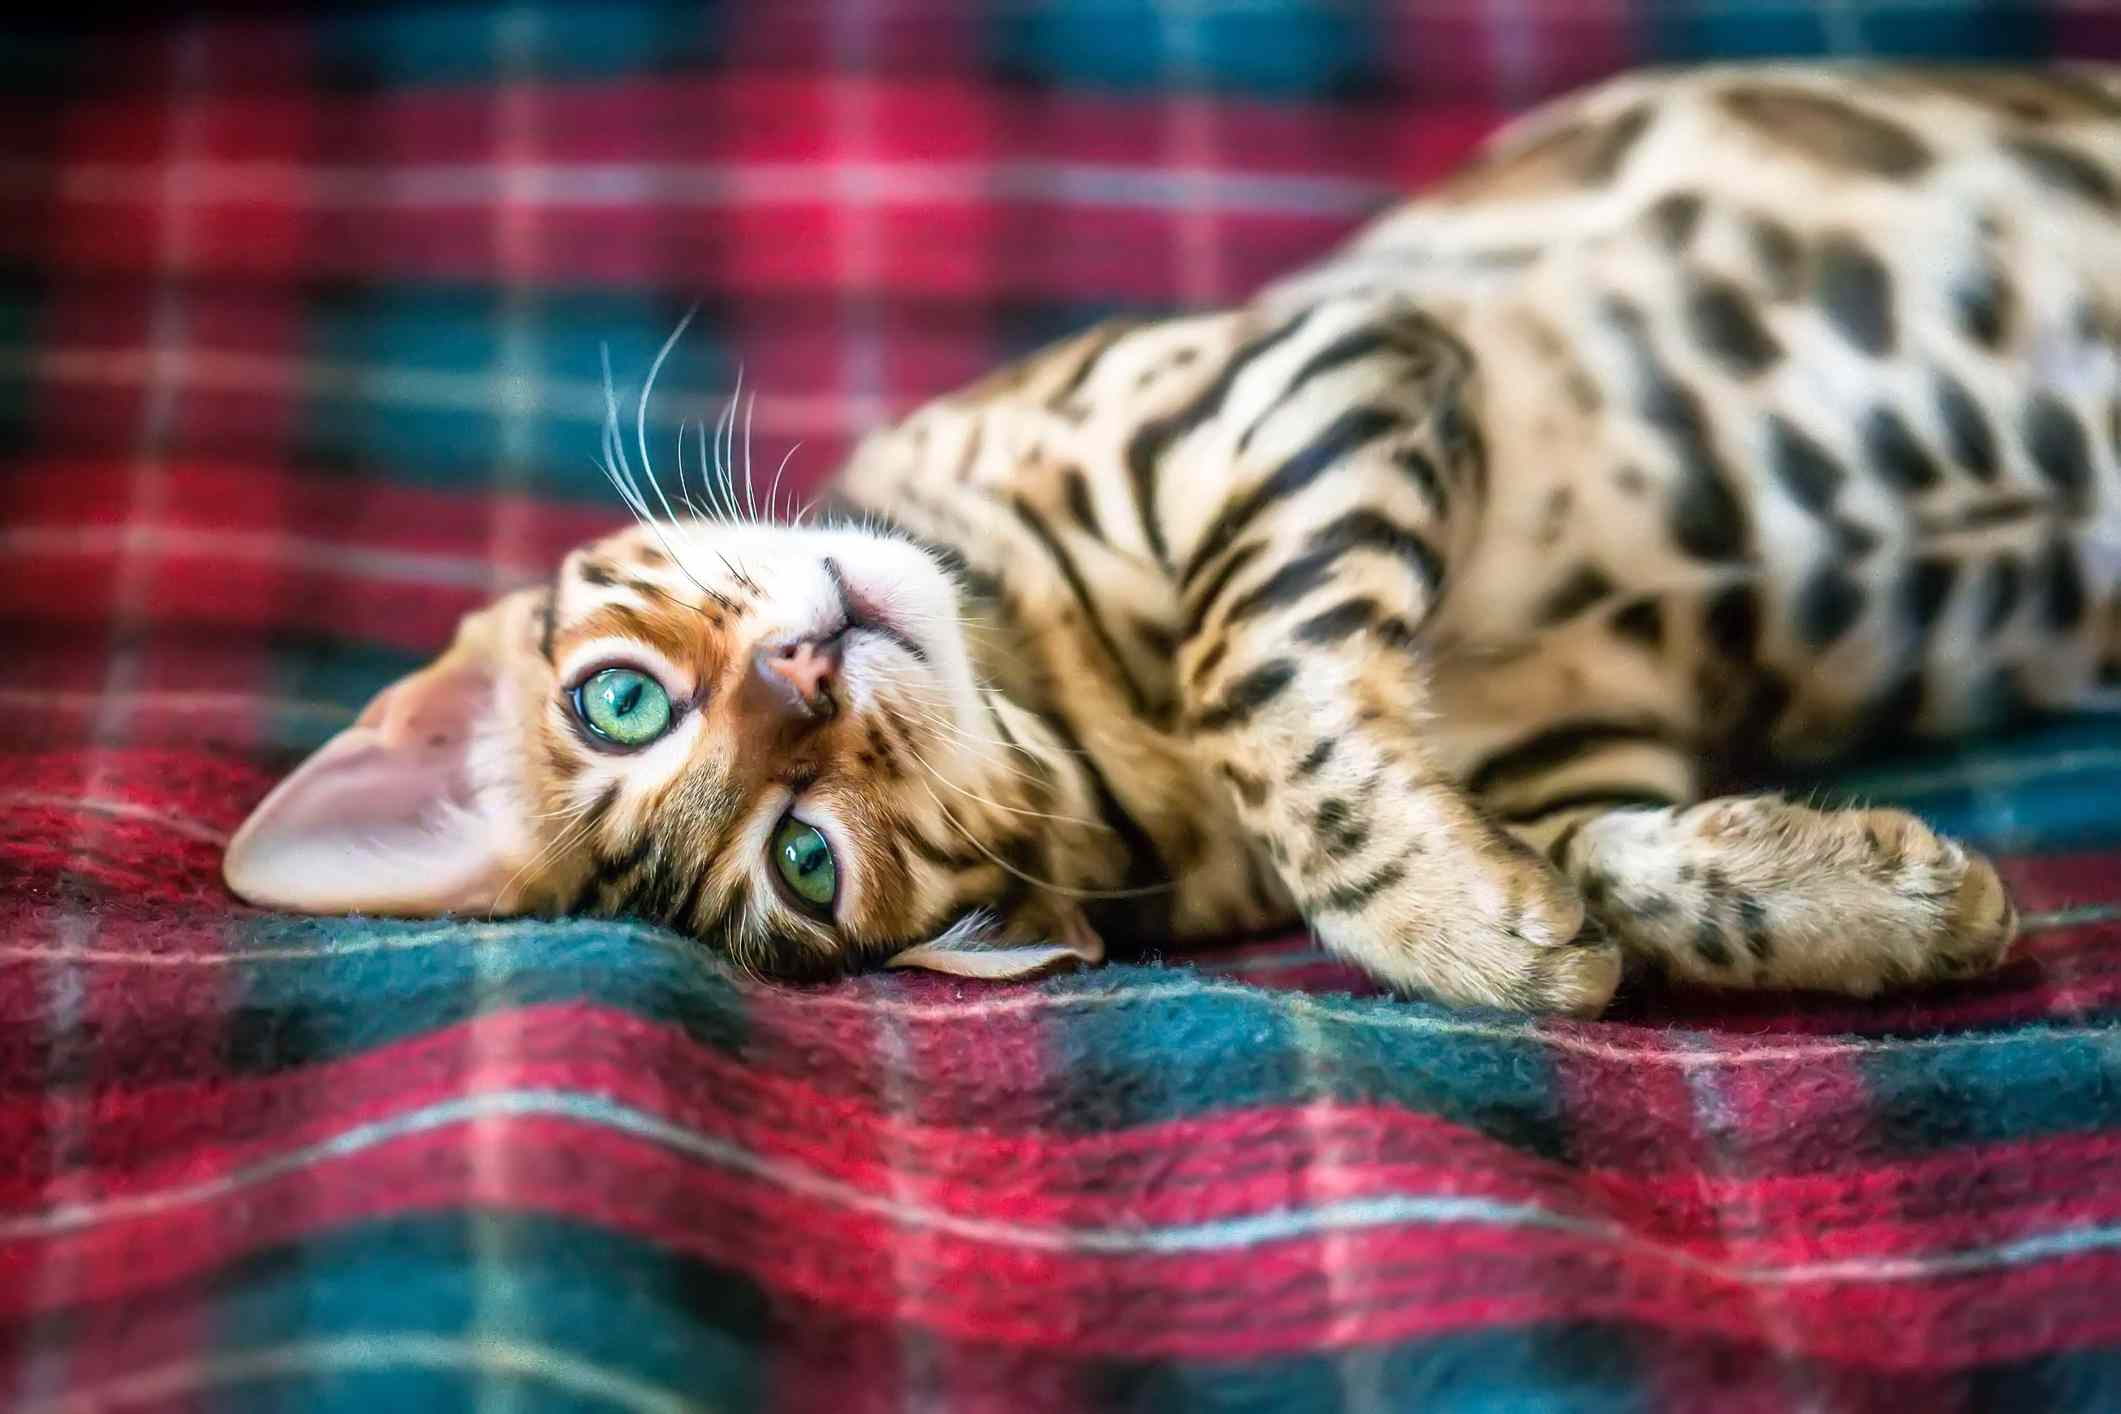 Bengal cat lying on its side